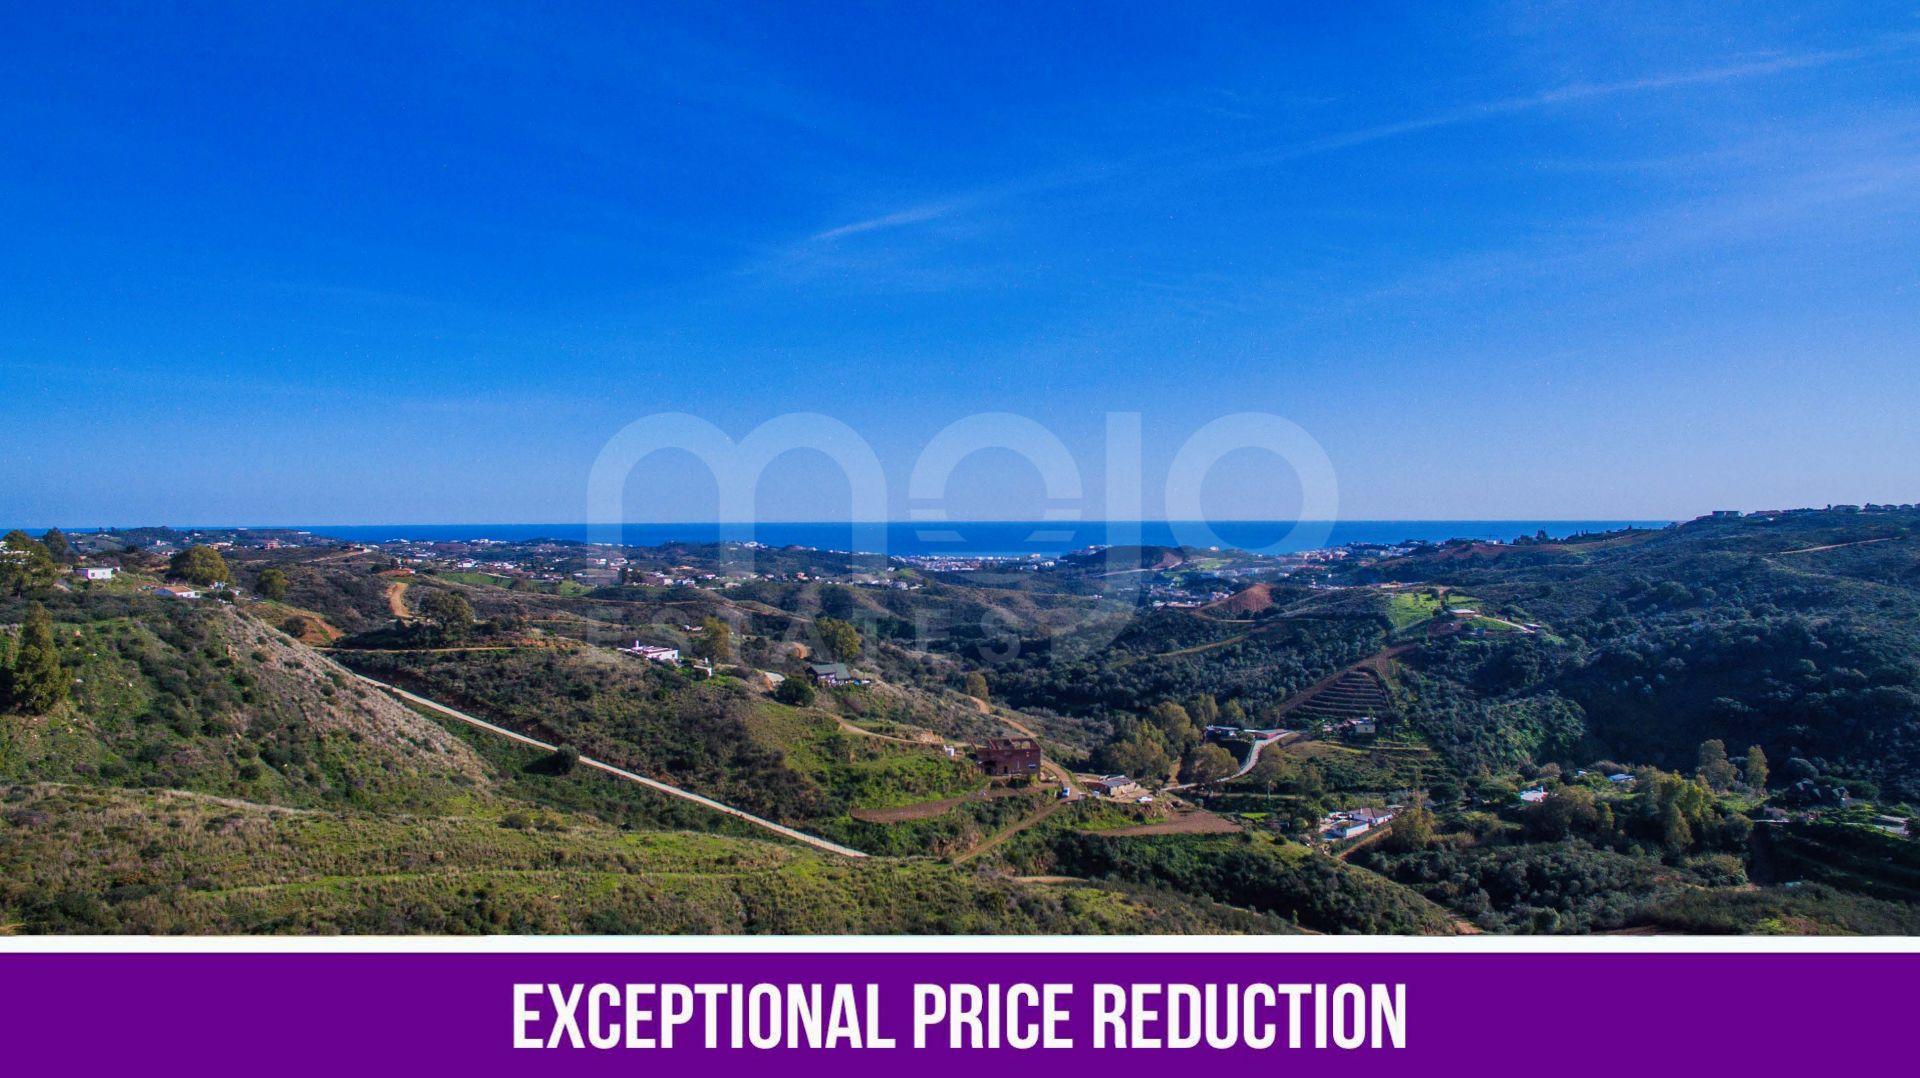 Terrain en vente à La Cala Golf, Mijas Costa